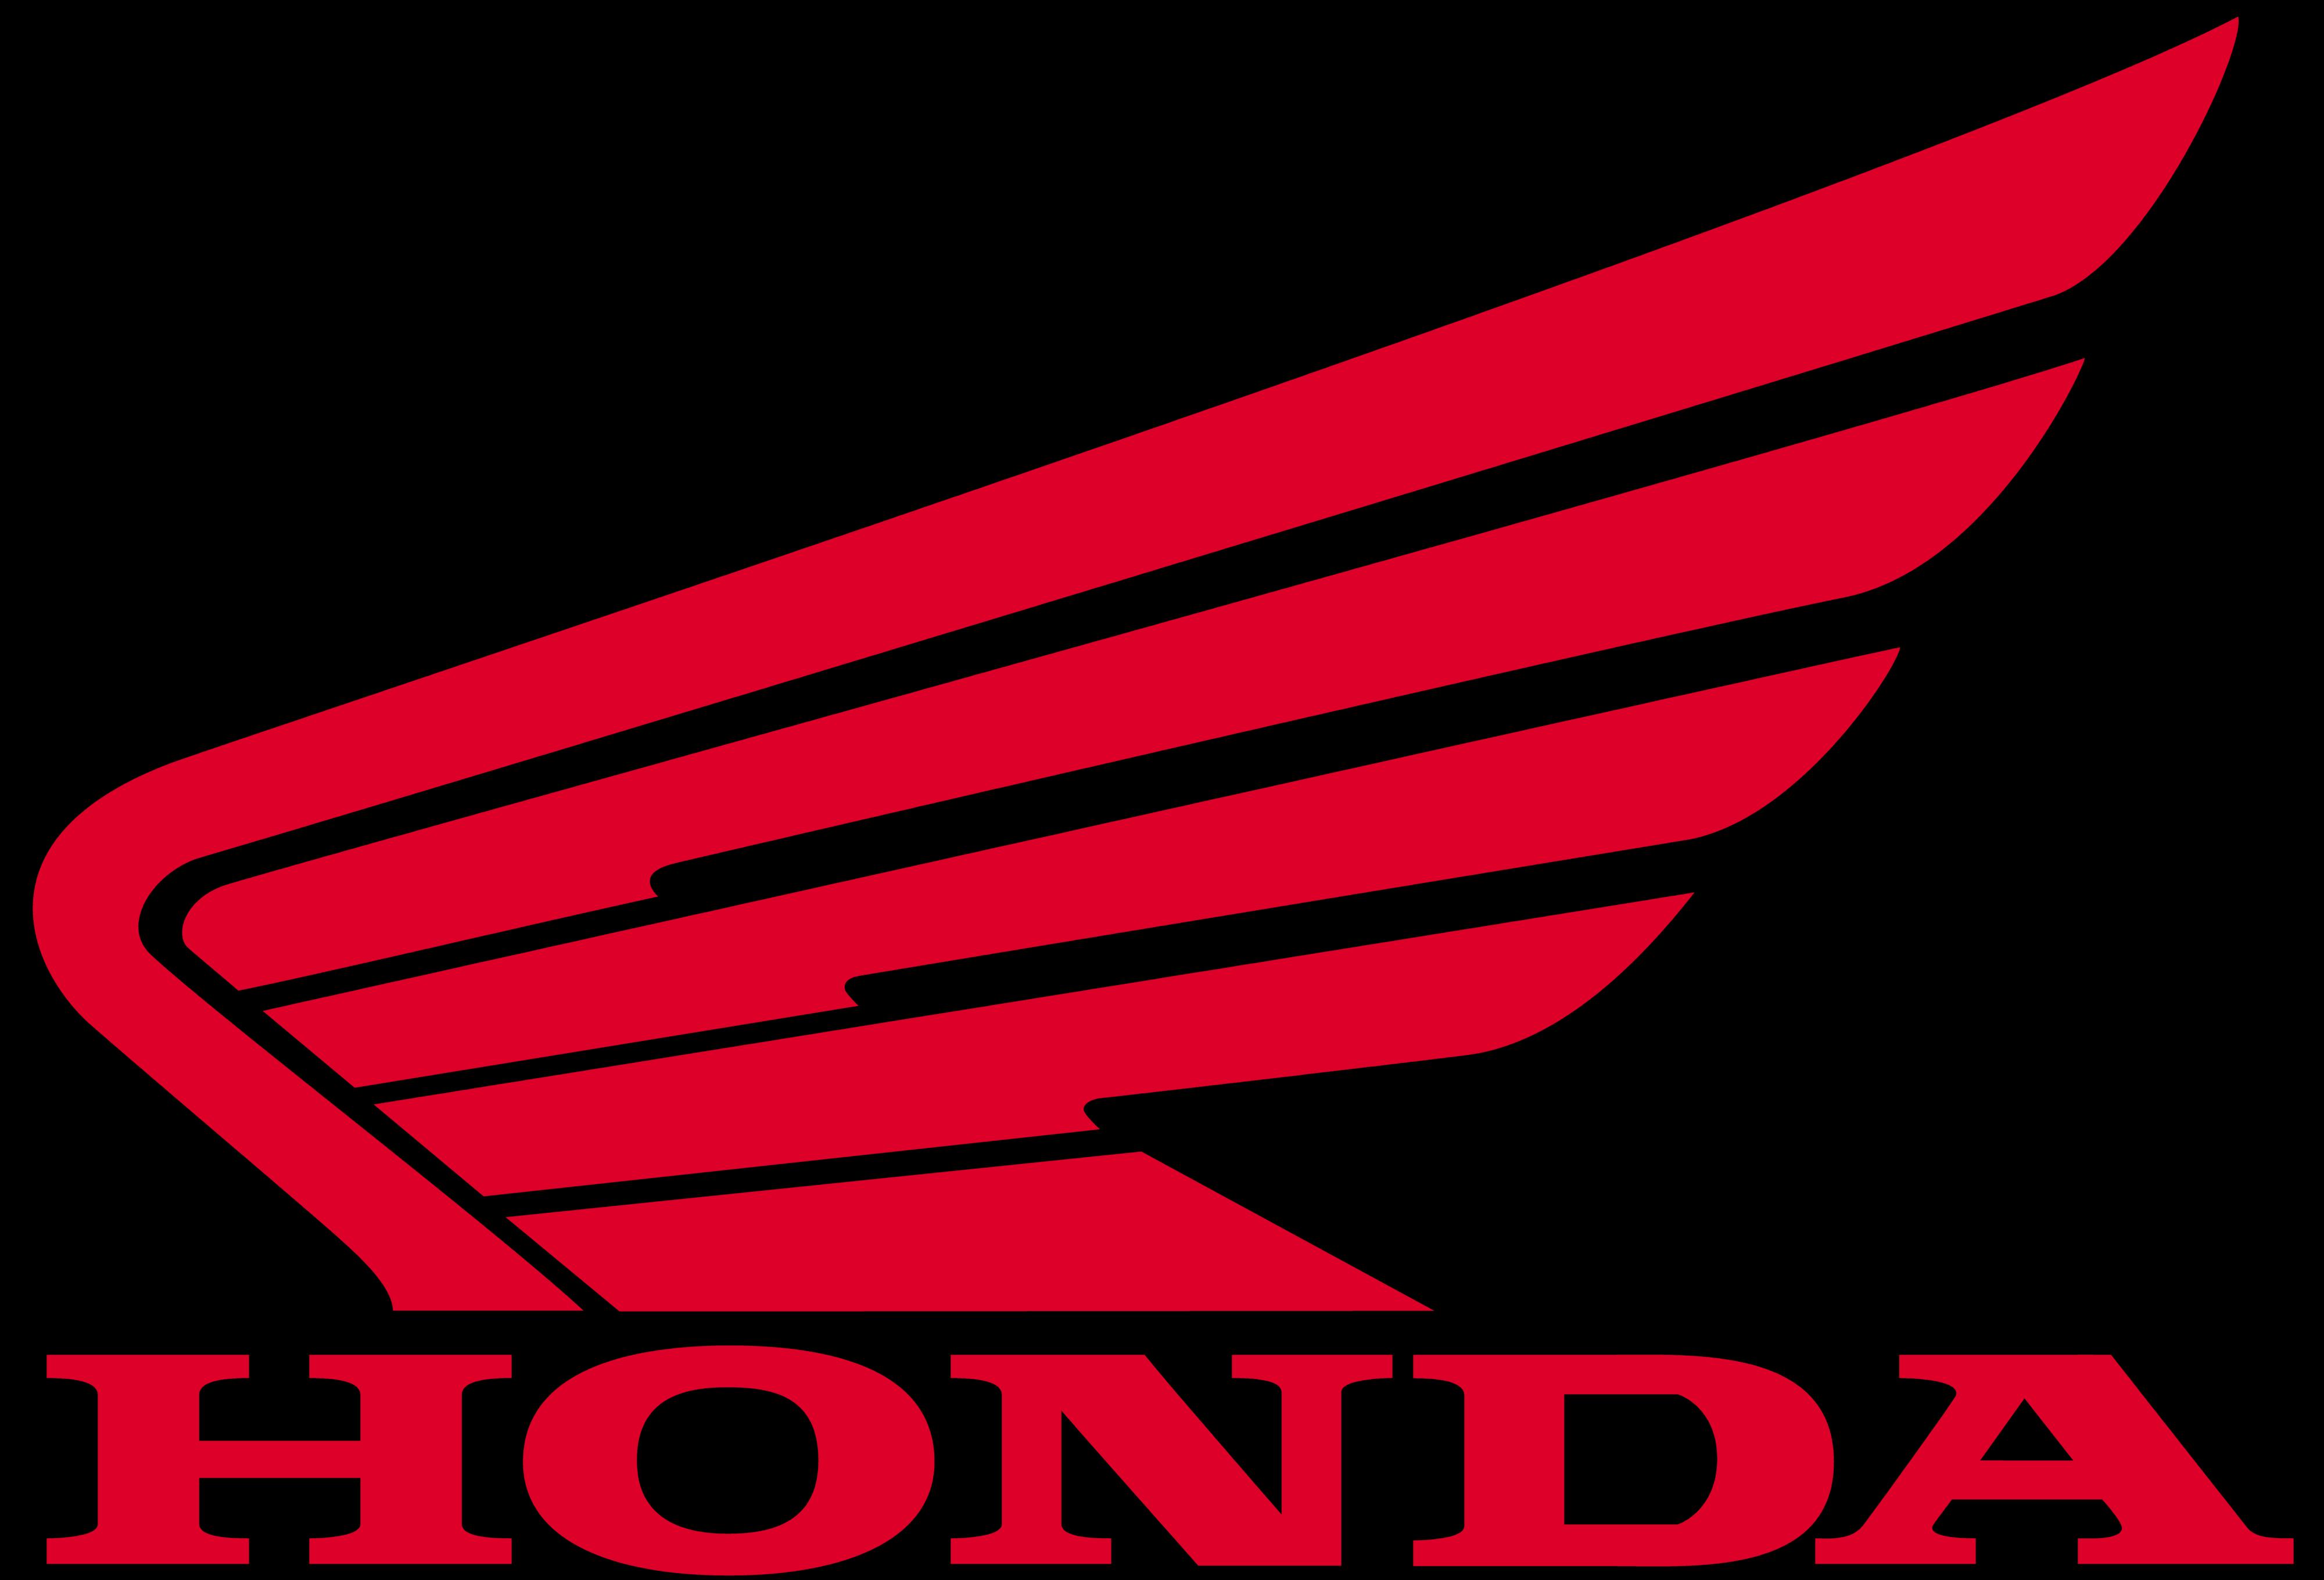 Honda Wings PNG - 111229